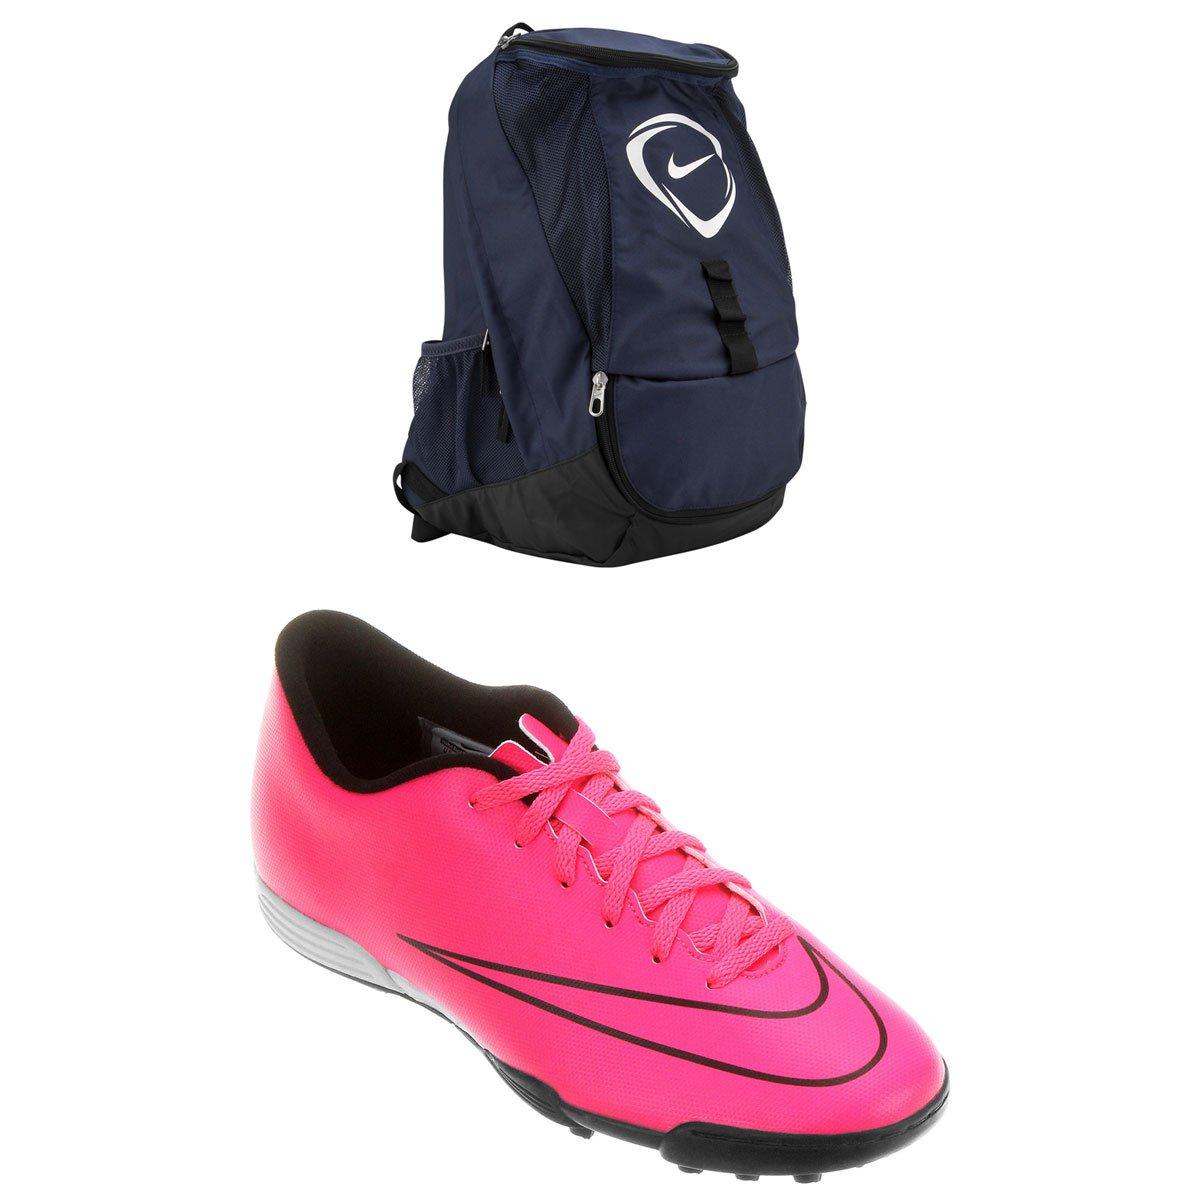 6b44f11ca Kit Chuteira Nike Mercurial Vortex 2 TF Society + Mochila Nike Football  Club Team - Compre Agora | Netshoes